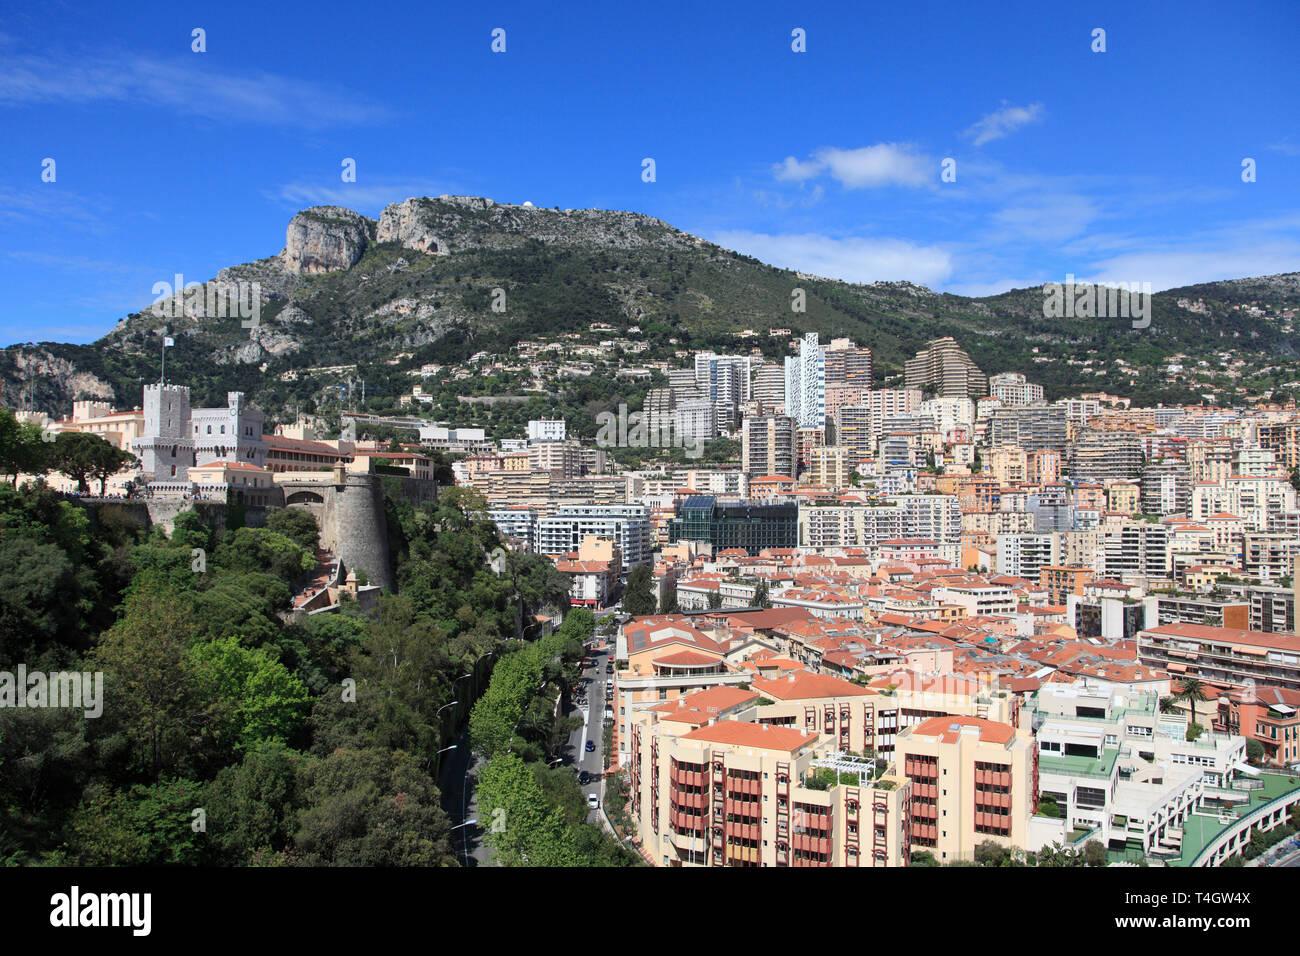 Princes of Grimaldi Palace, Royal Palace, Monaco-Ville, Le Rocher, The Rock, La Condamine, Monaco, Cote d Azur, Europe - Stock Image